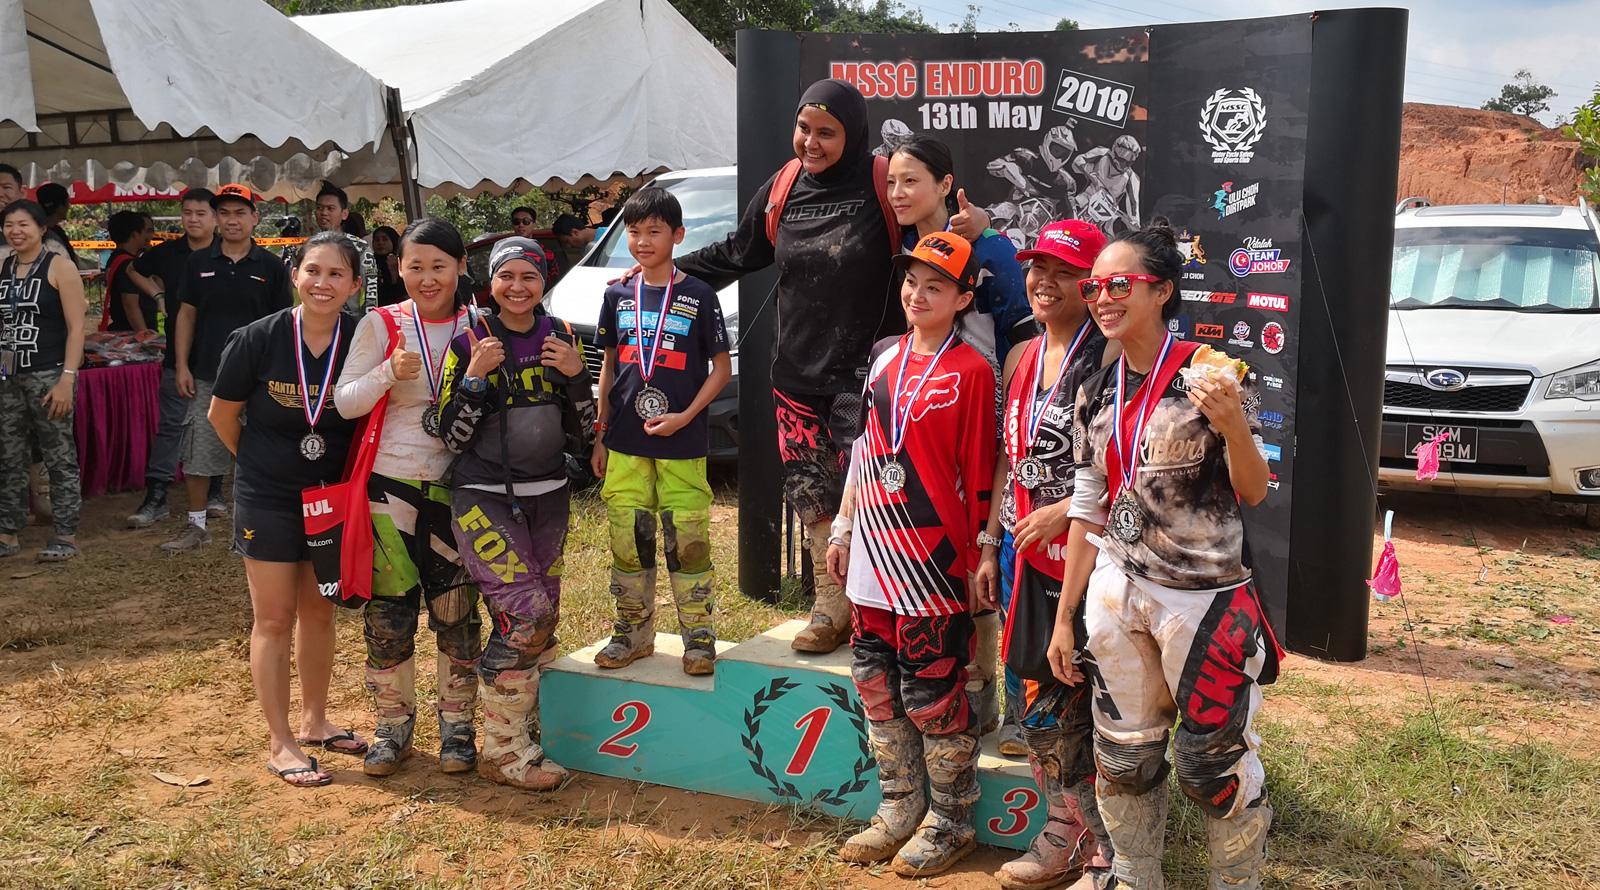 MSSC Enduro Race 2018 Ladies Kids class